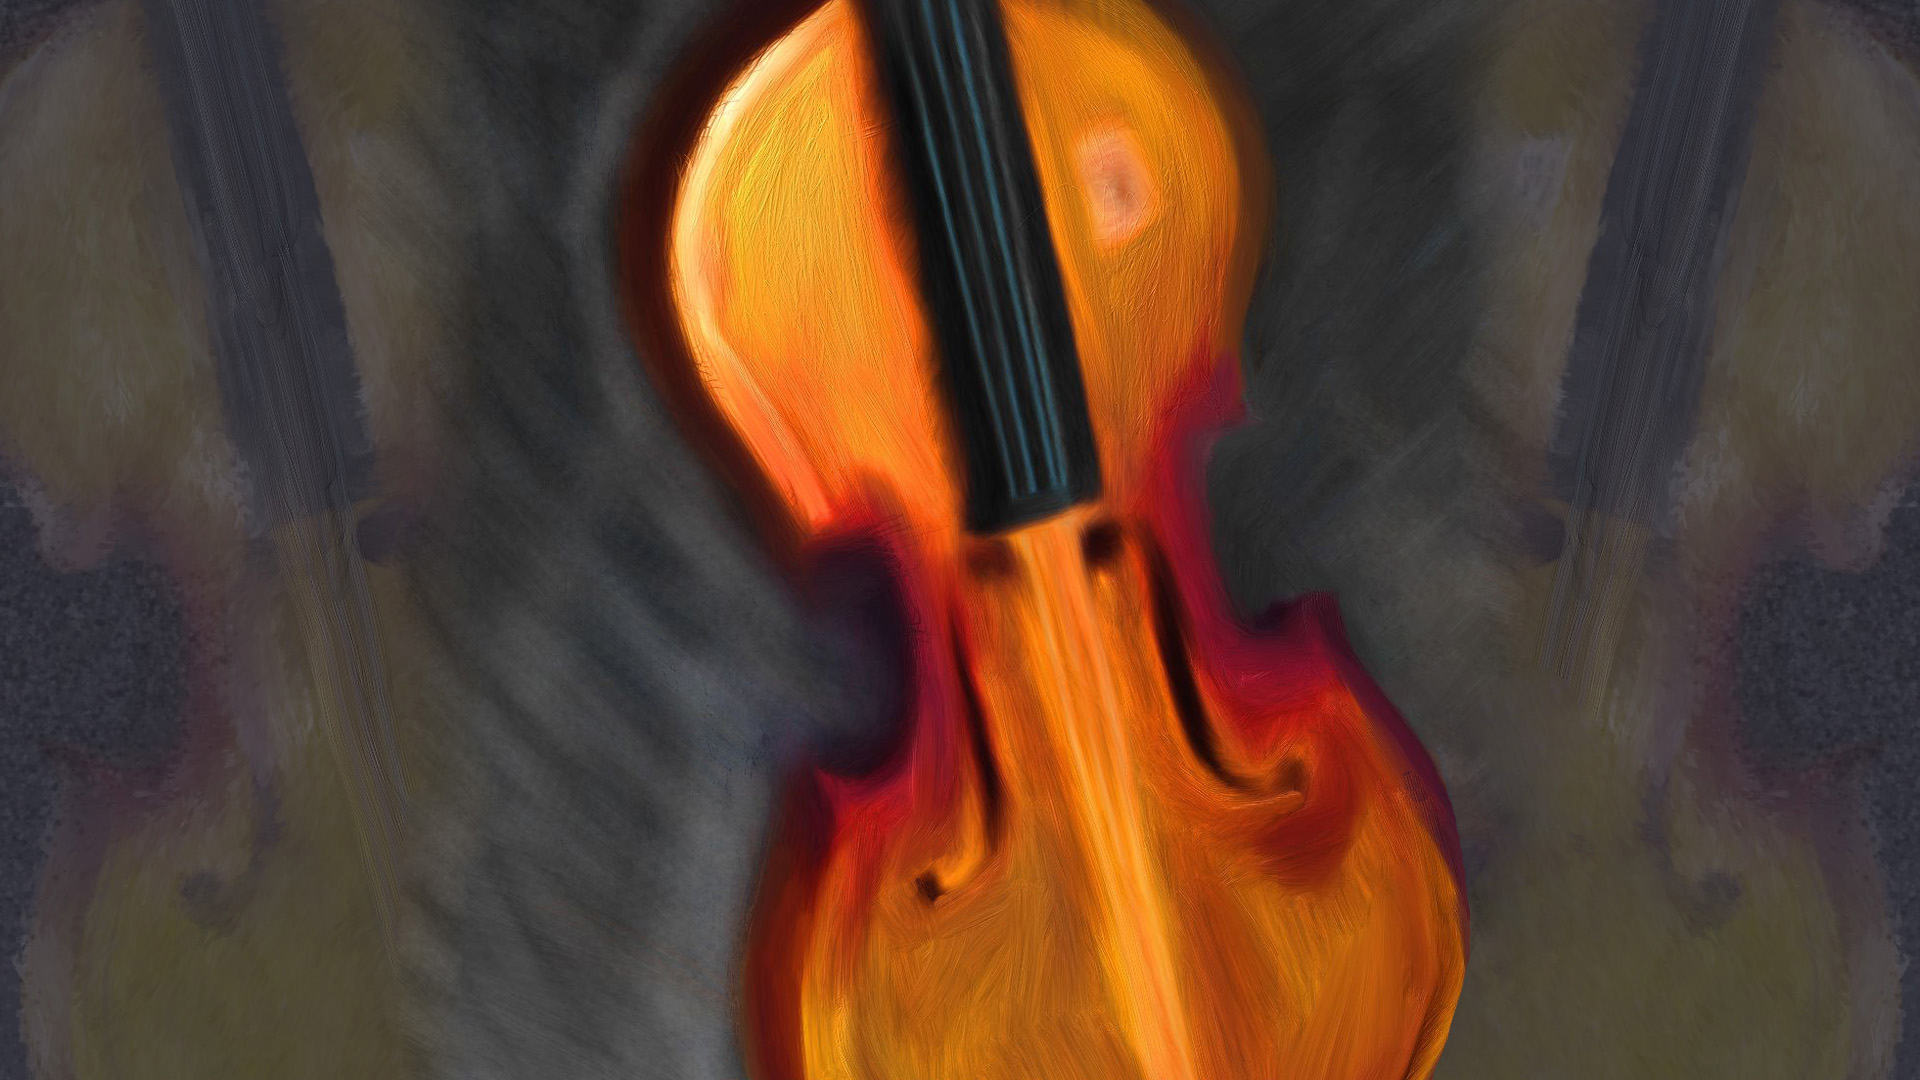 Violin3_Wallpaper